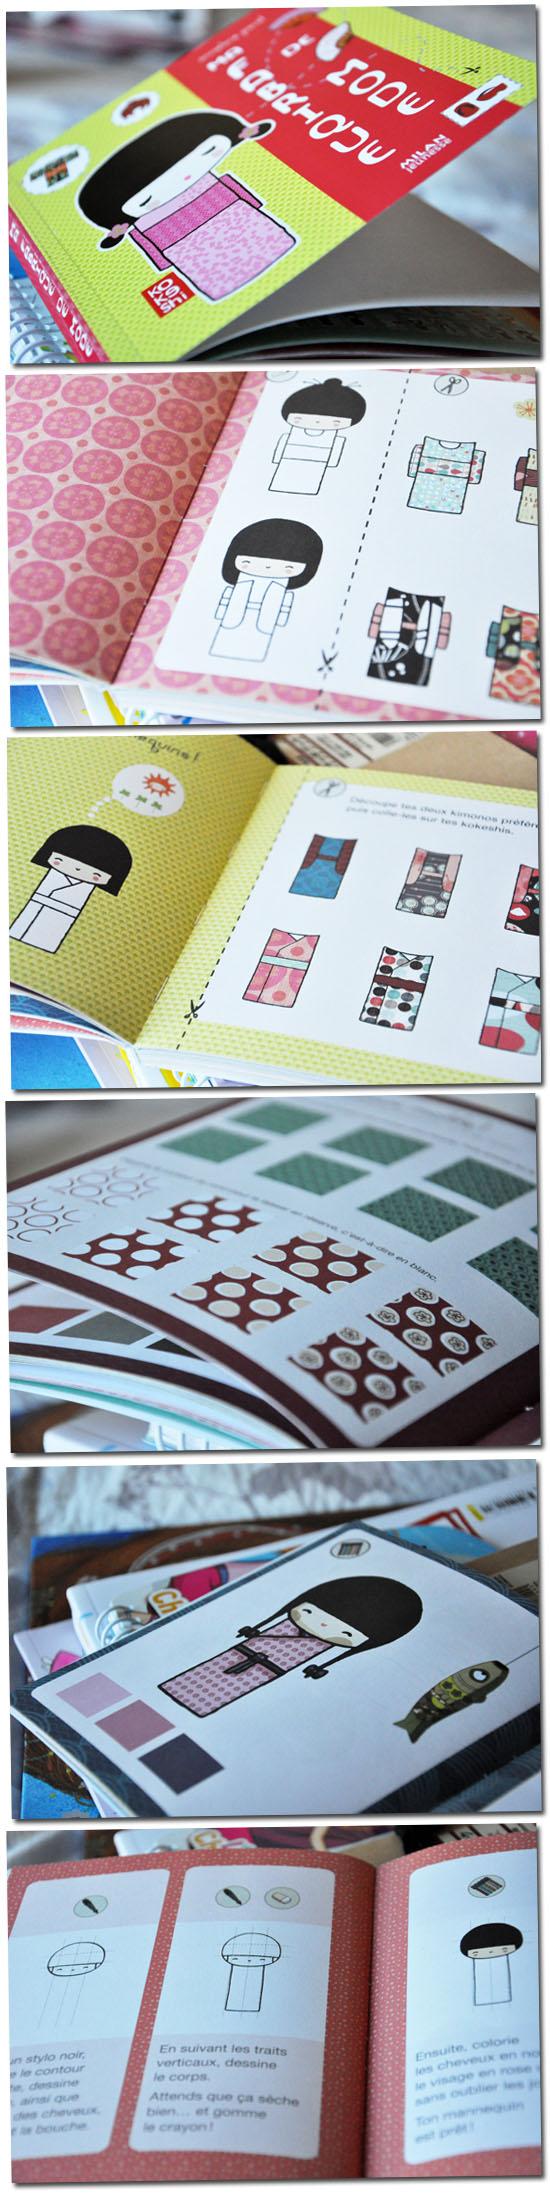 http://www.lautreatelier.fr/images/blogaluna/noelcrea5.jpg